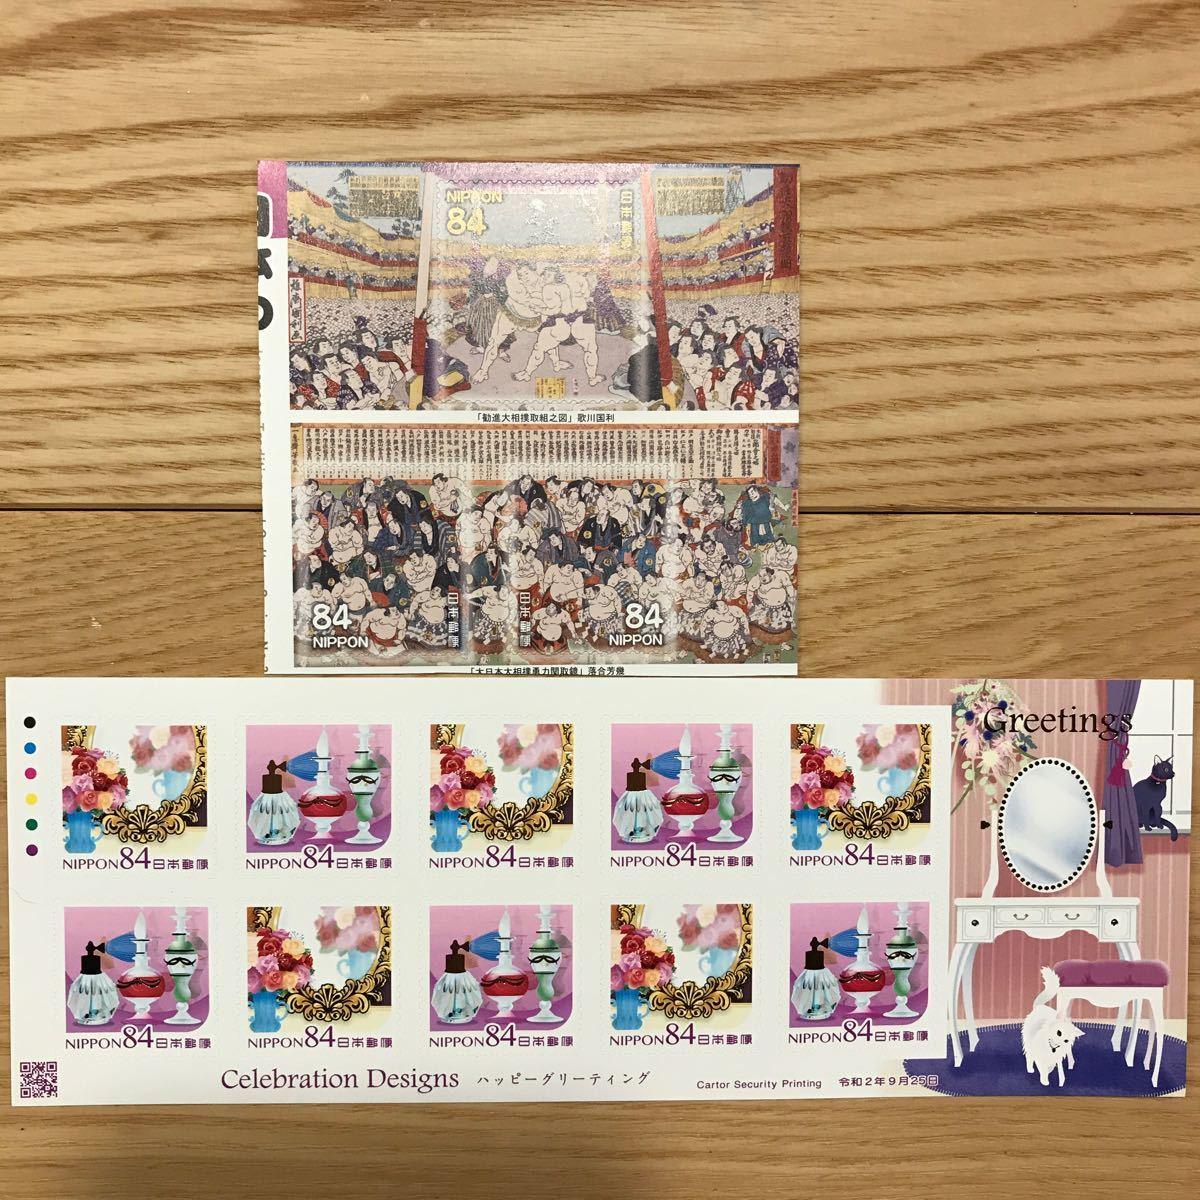 記念切手 1092円分